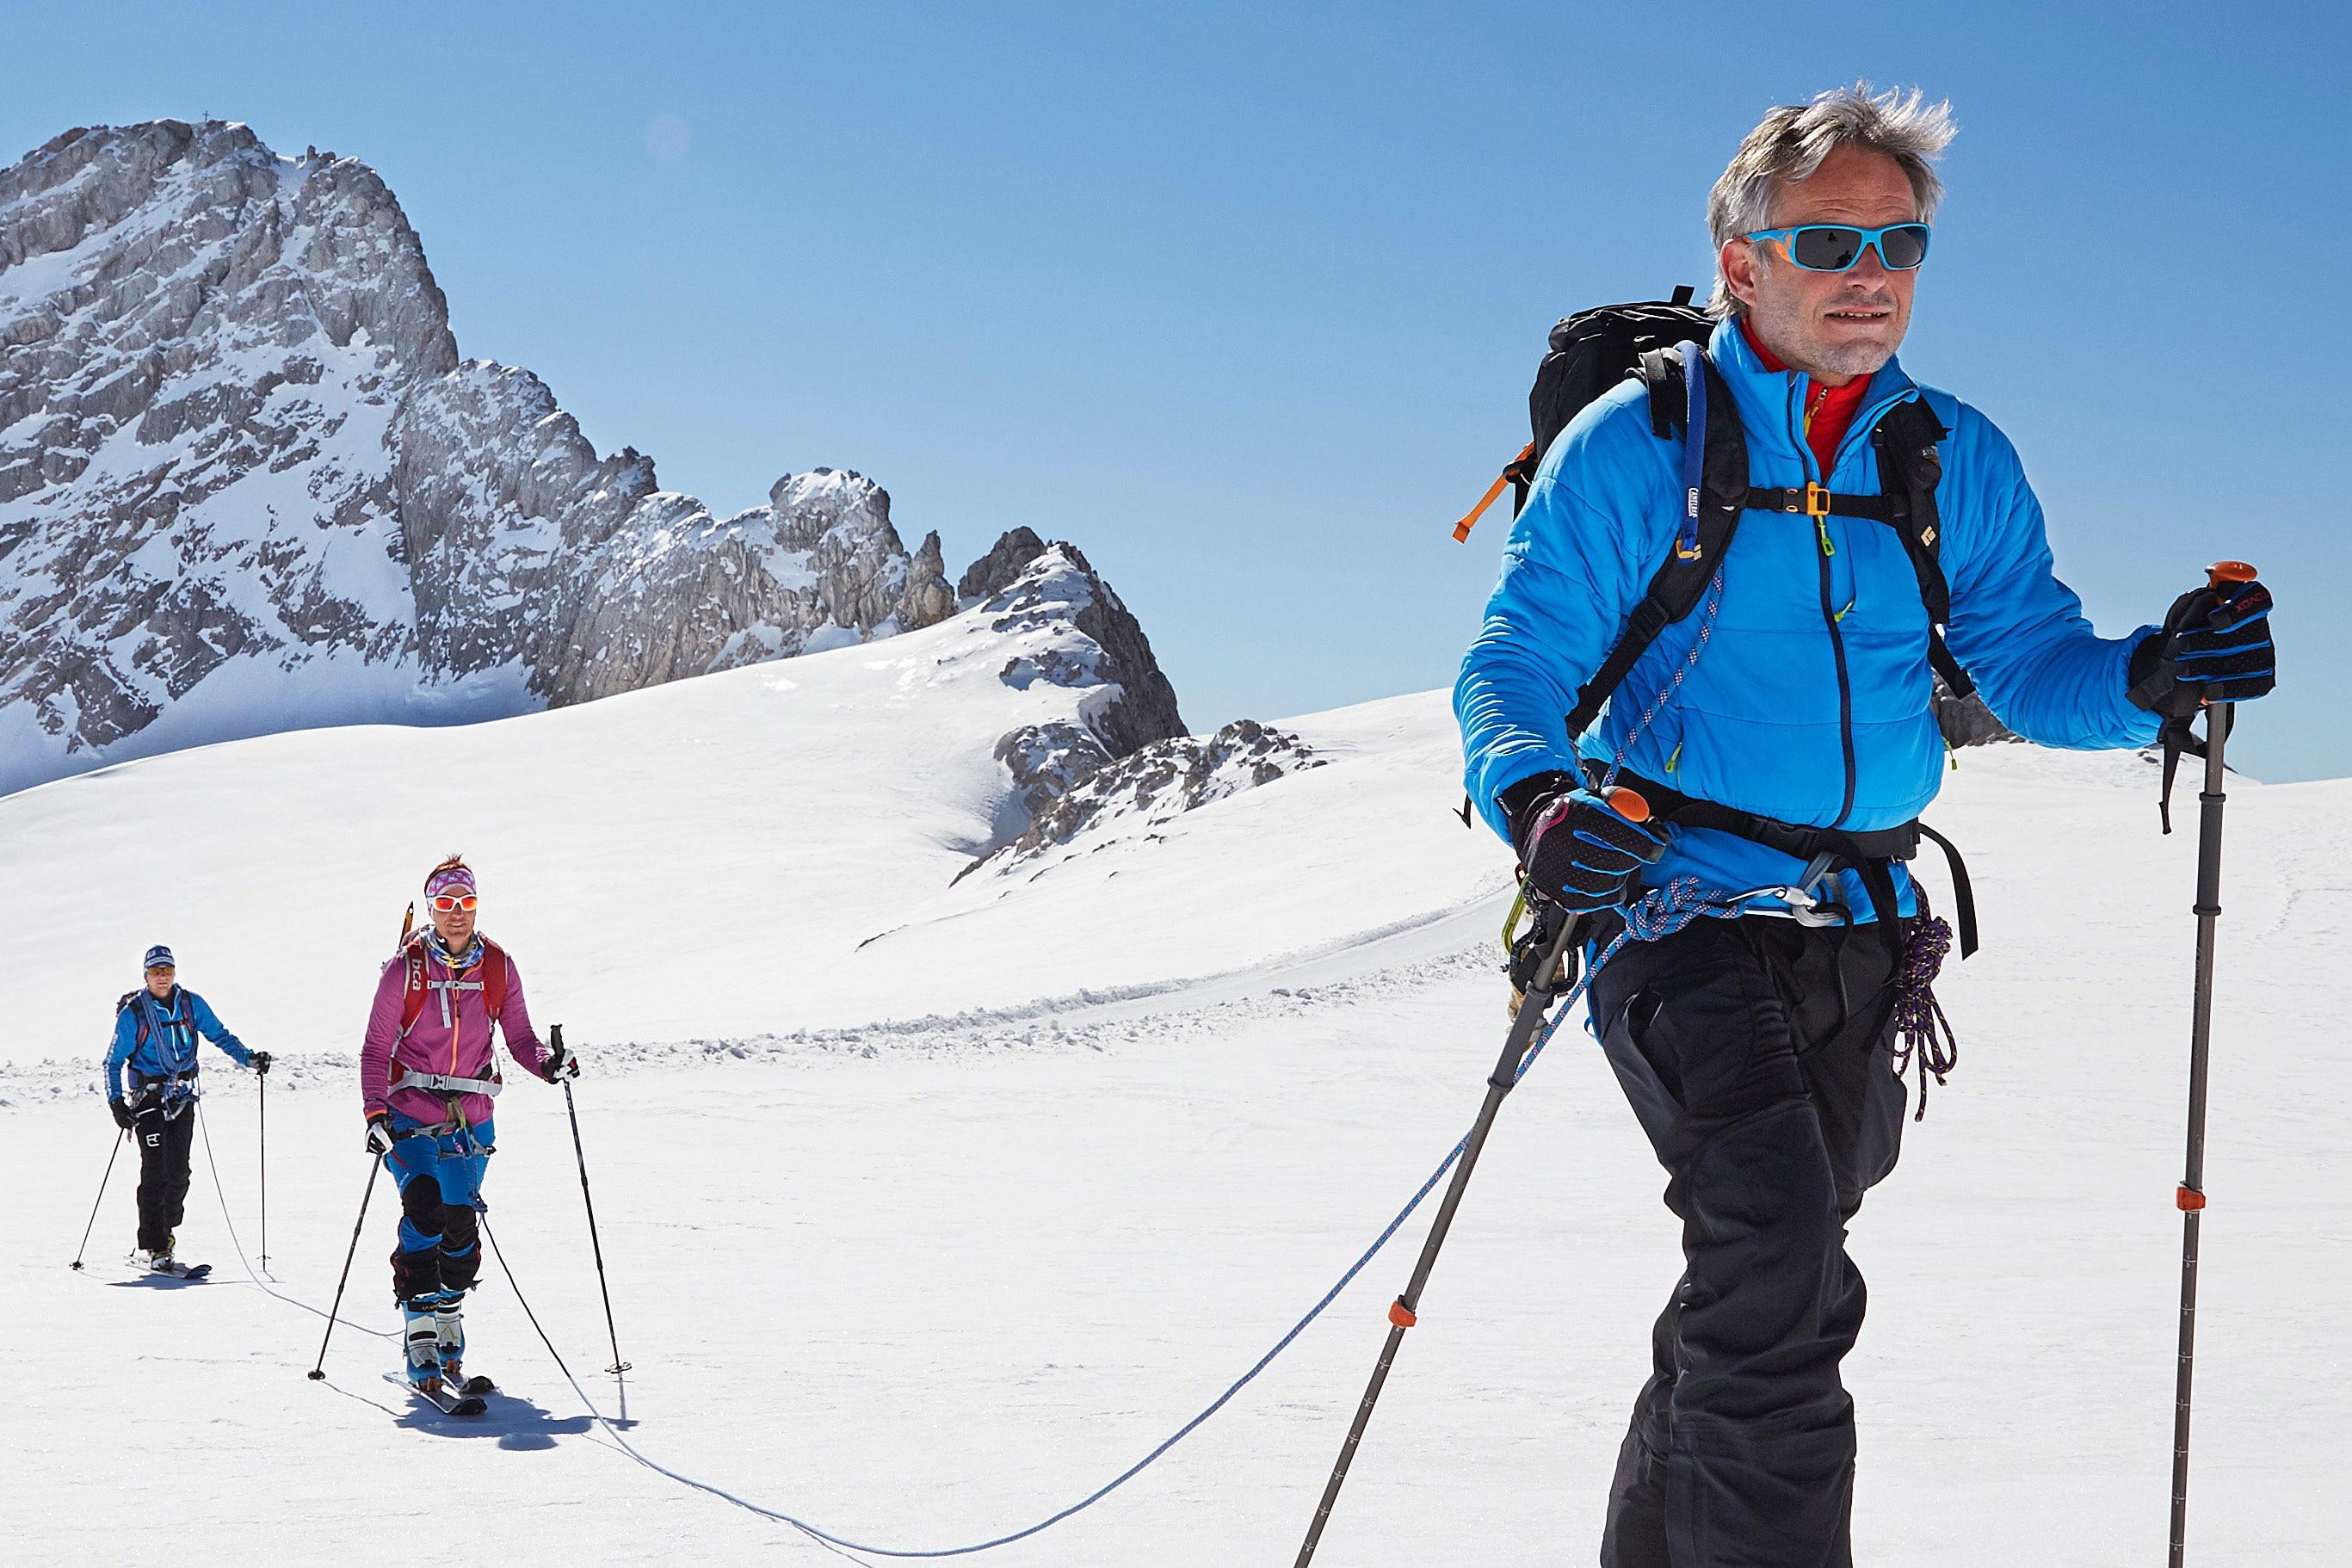 Black Diamond Couloir Klettergurt Test : Produkttest bergwelten